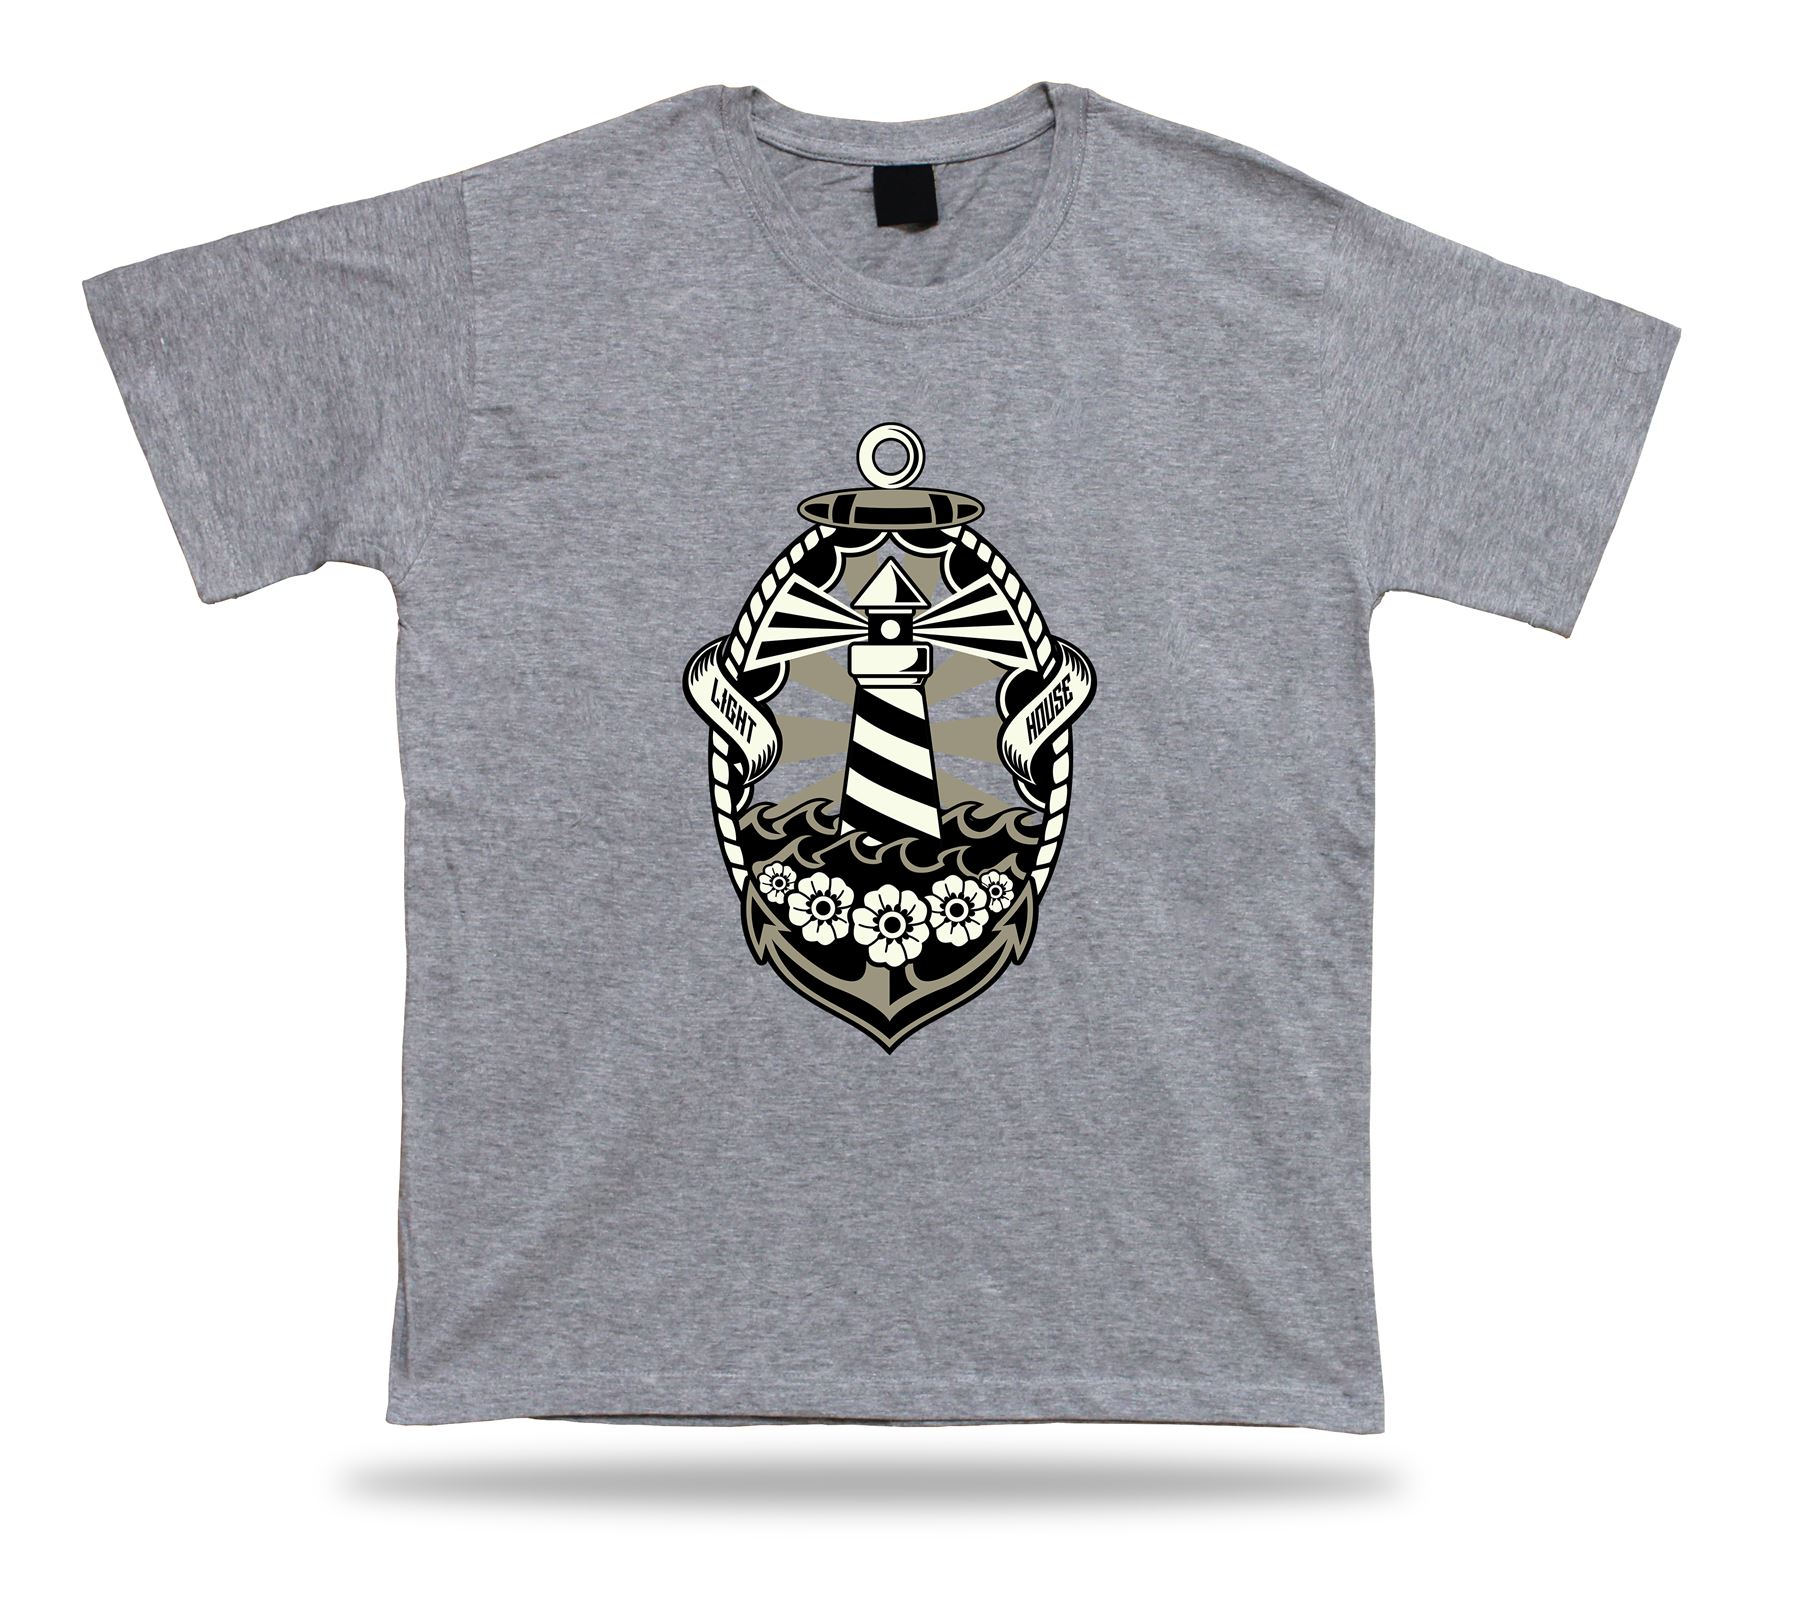 Lighthouse Floral Sea Anchor cool t shirt modern design birthday present tee